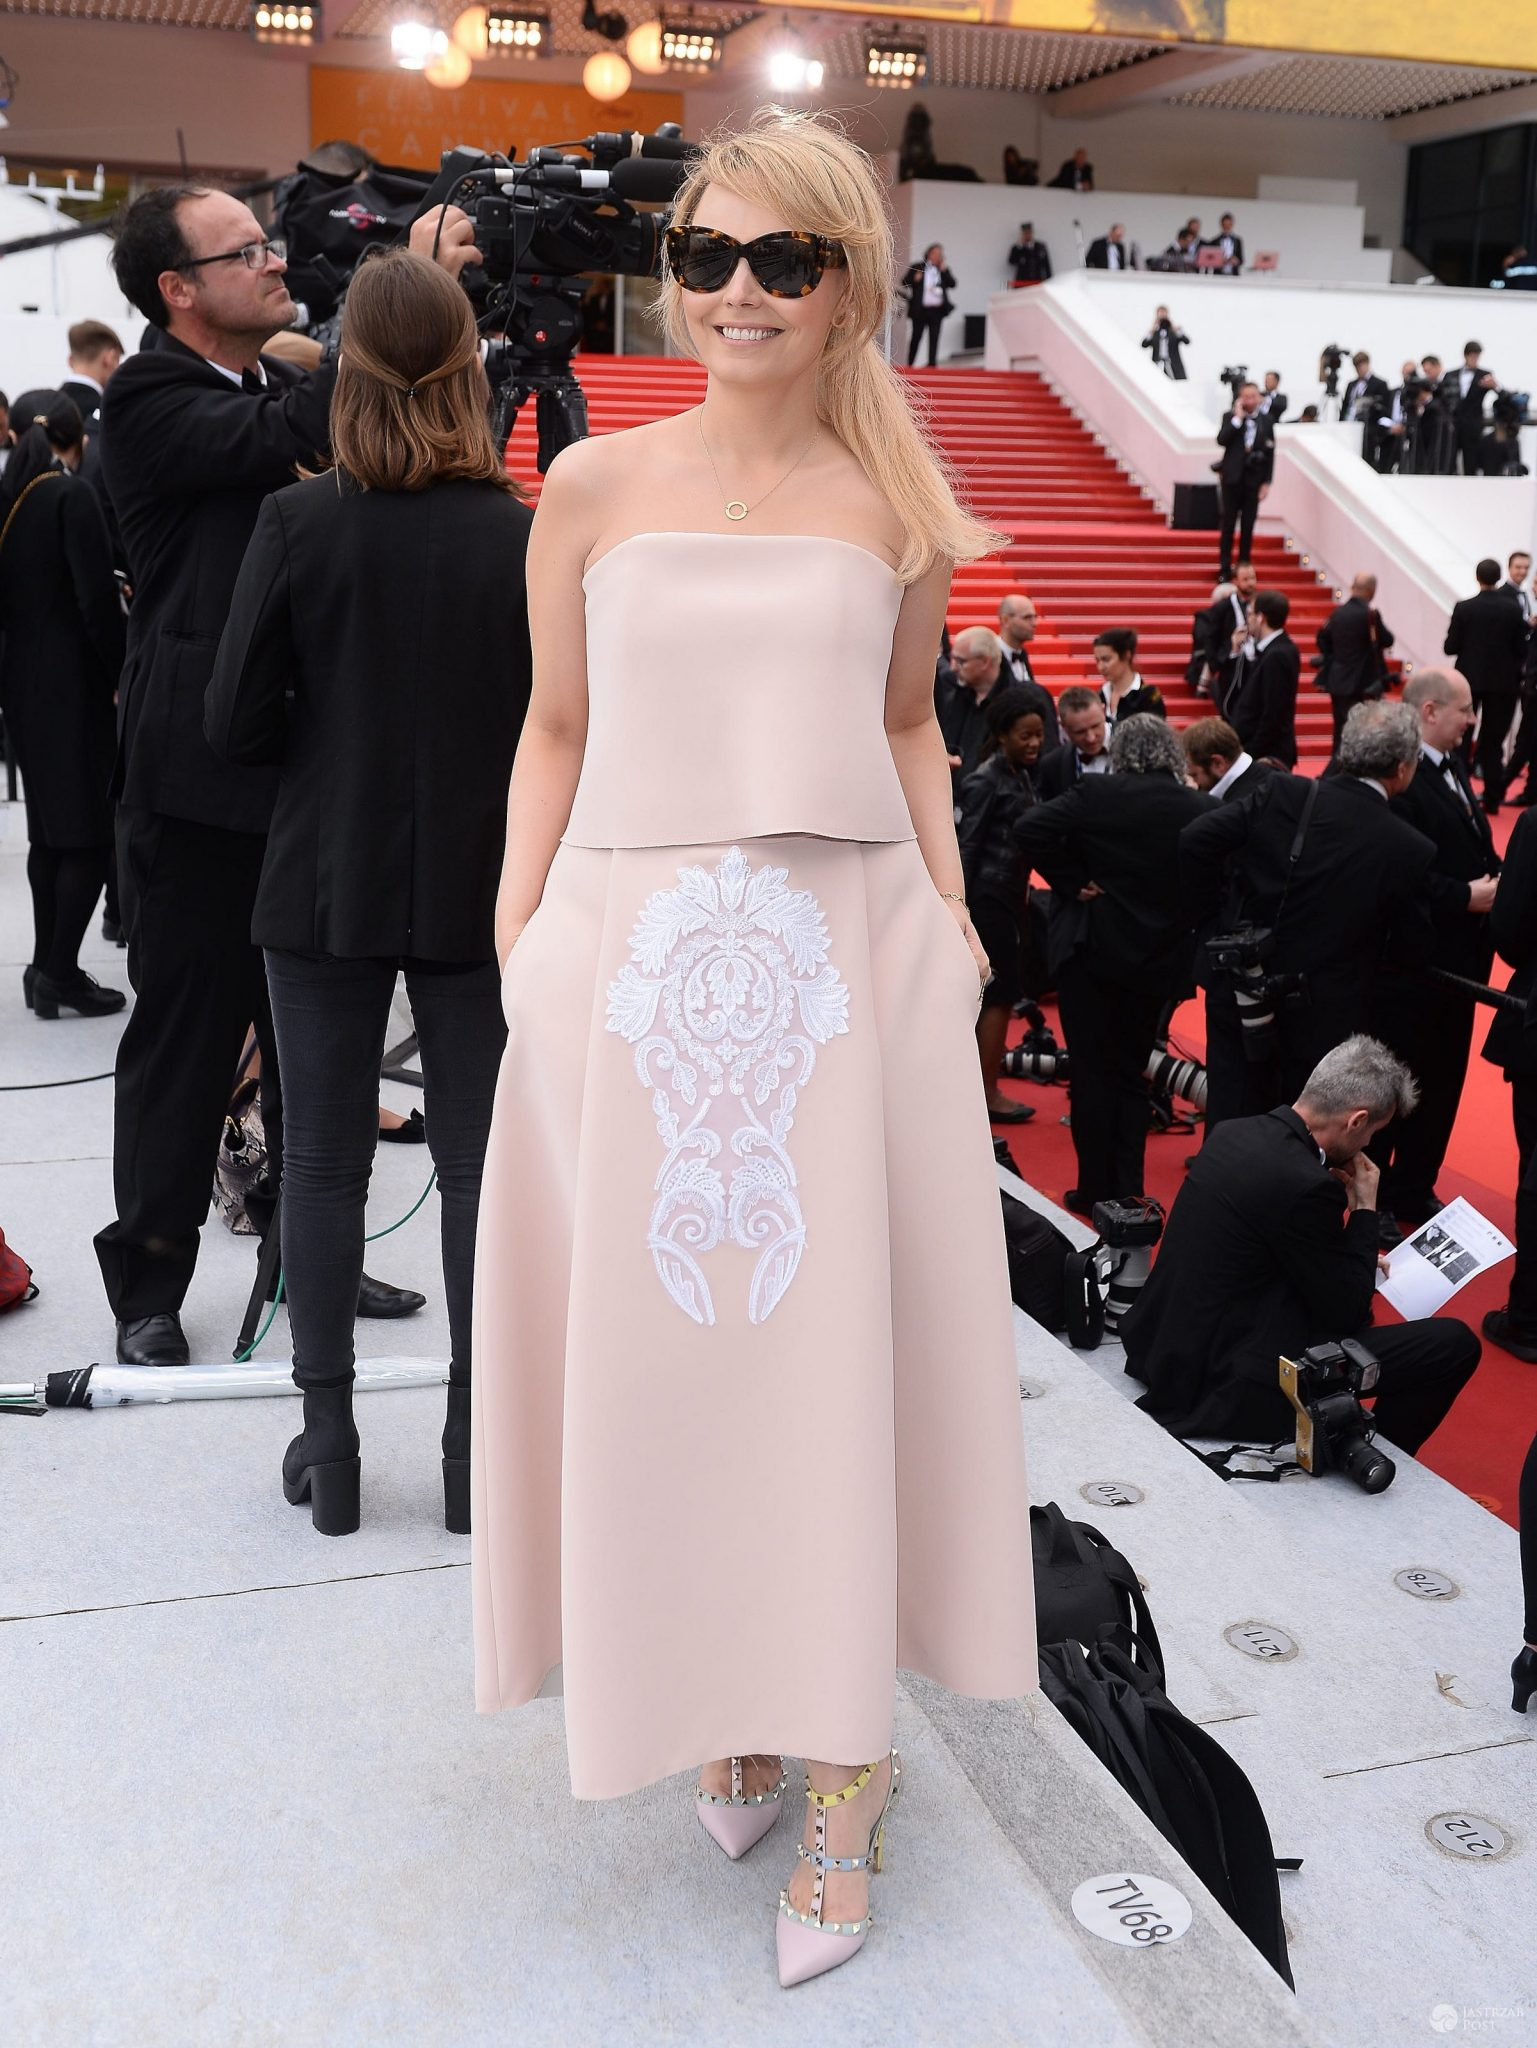 Kreacja: Bizuu. Agnieszka Jastrzębska na festiwalu w Cannes 2016 (fot. ONS)